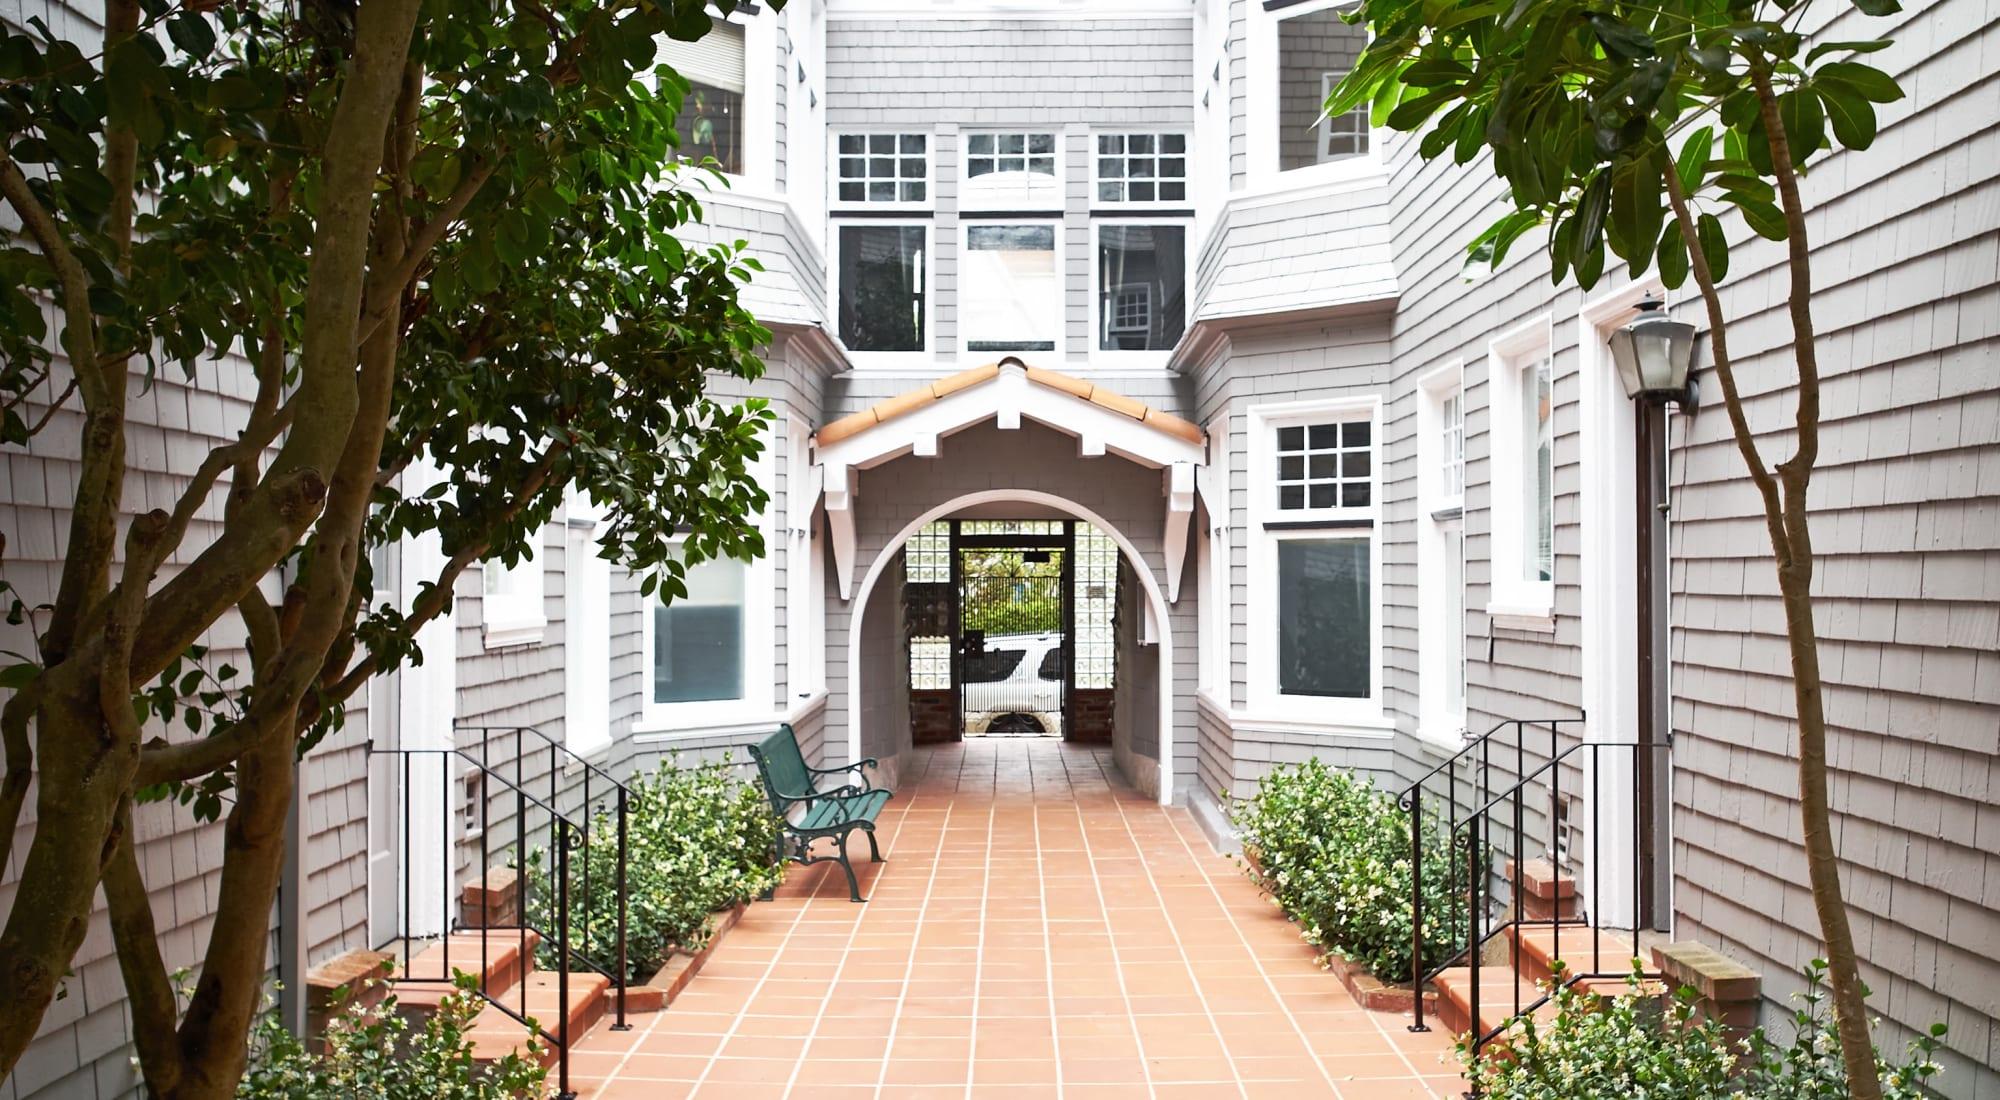 833 Ashbury apartments in San Francisco, California